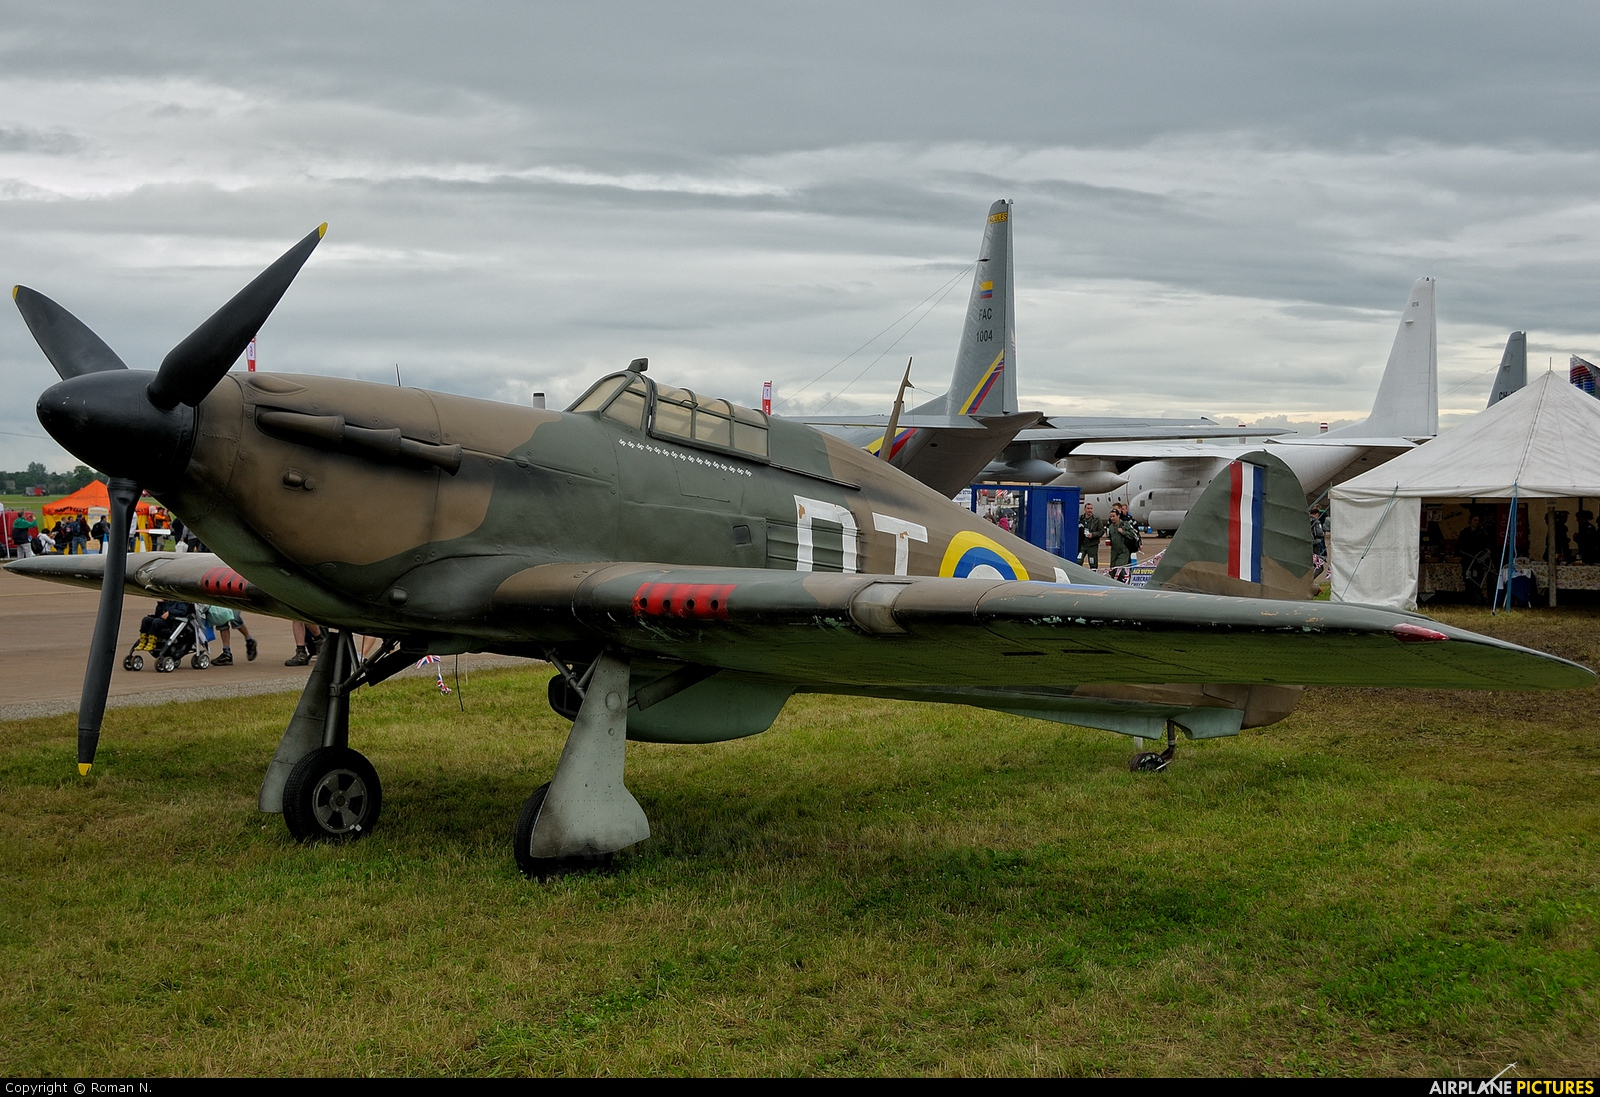 Private V6555 aircraft at Fairford